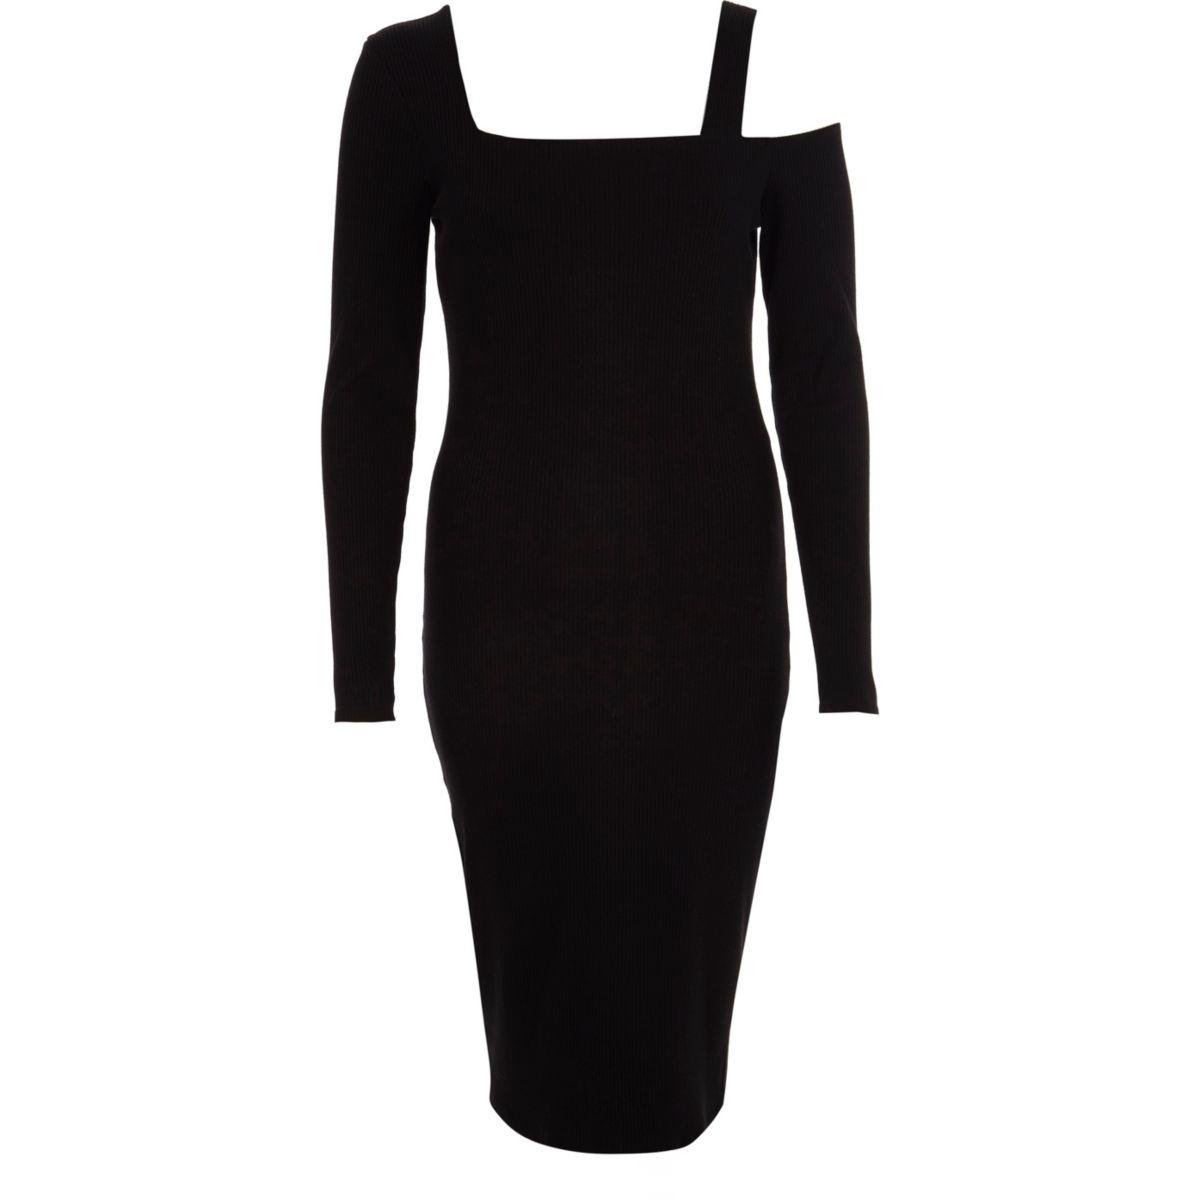 Black one shoulder long sleeve bodycon dress